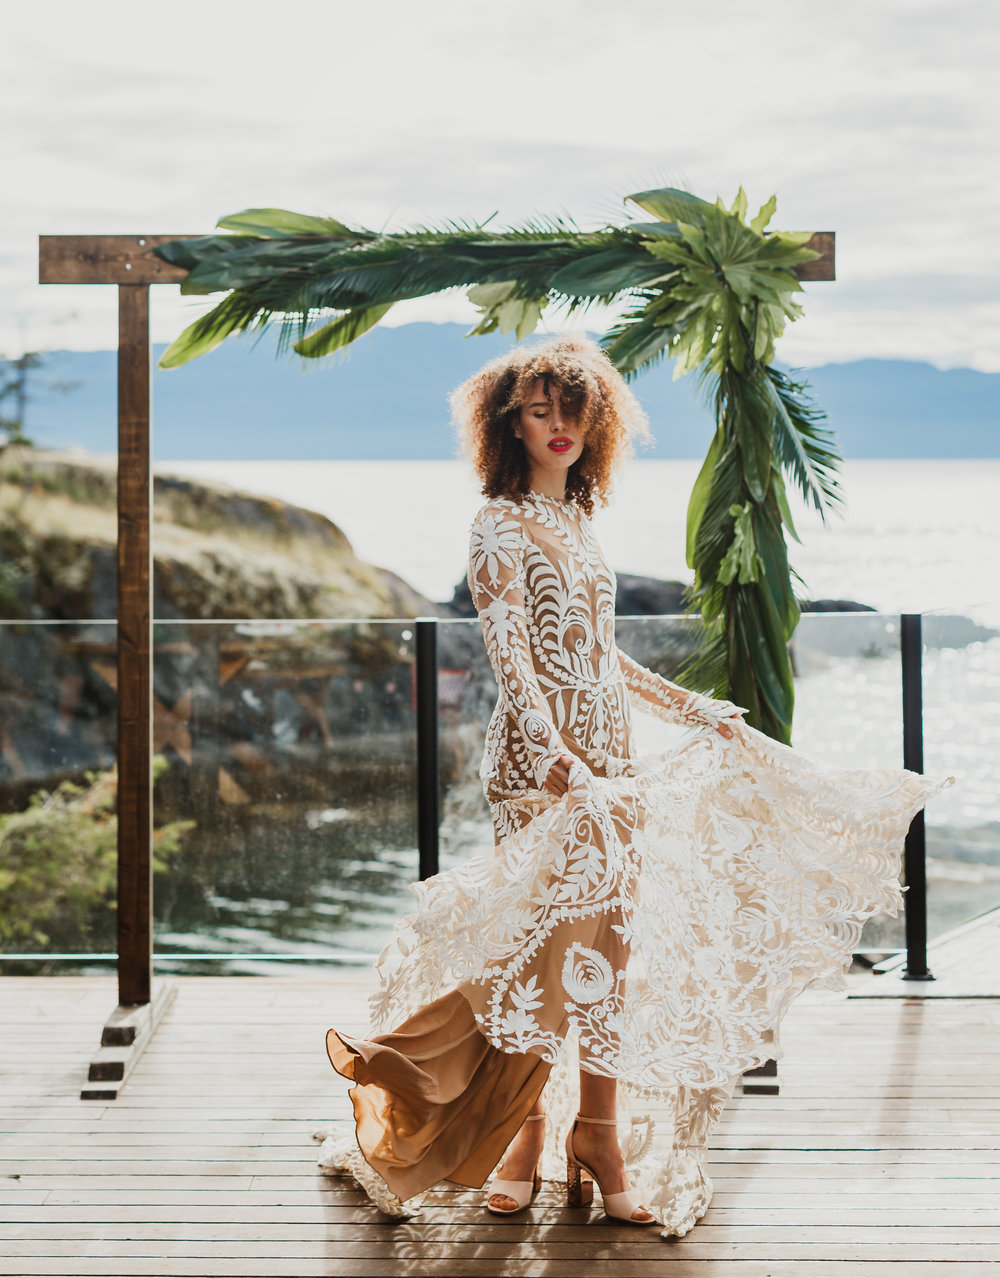 West Coast Bride - Vancouver Wedding Photographer & Videographer - Sunshine Coast Wedding Photos - Sunshine Coast Wedding Photographer - Jennifer Picard Photography - IMG_7575.jpg